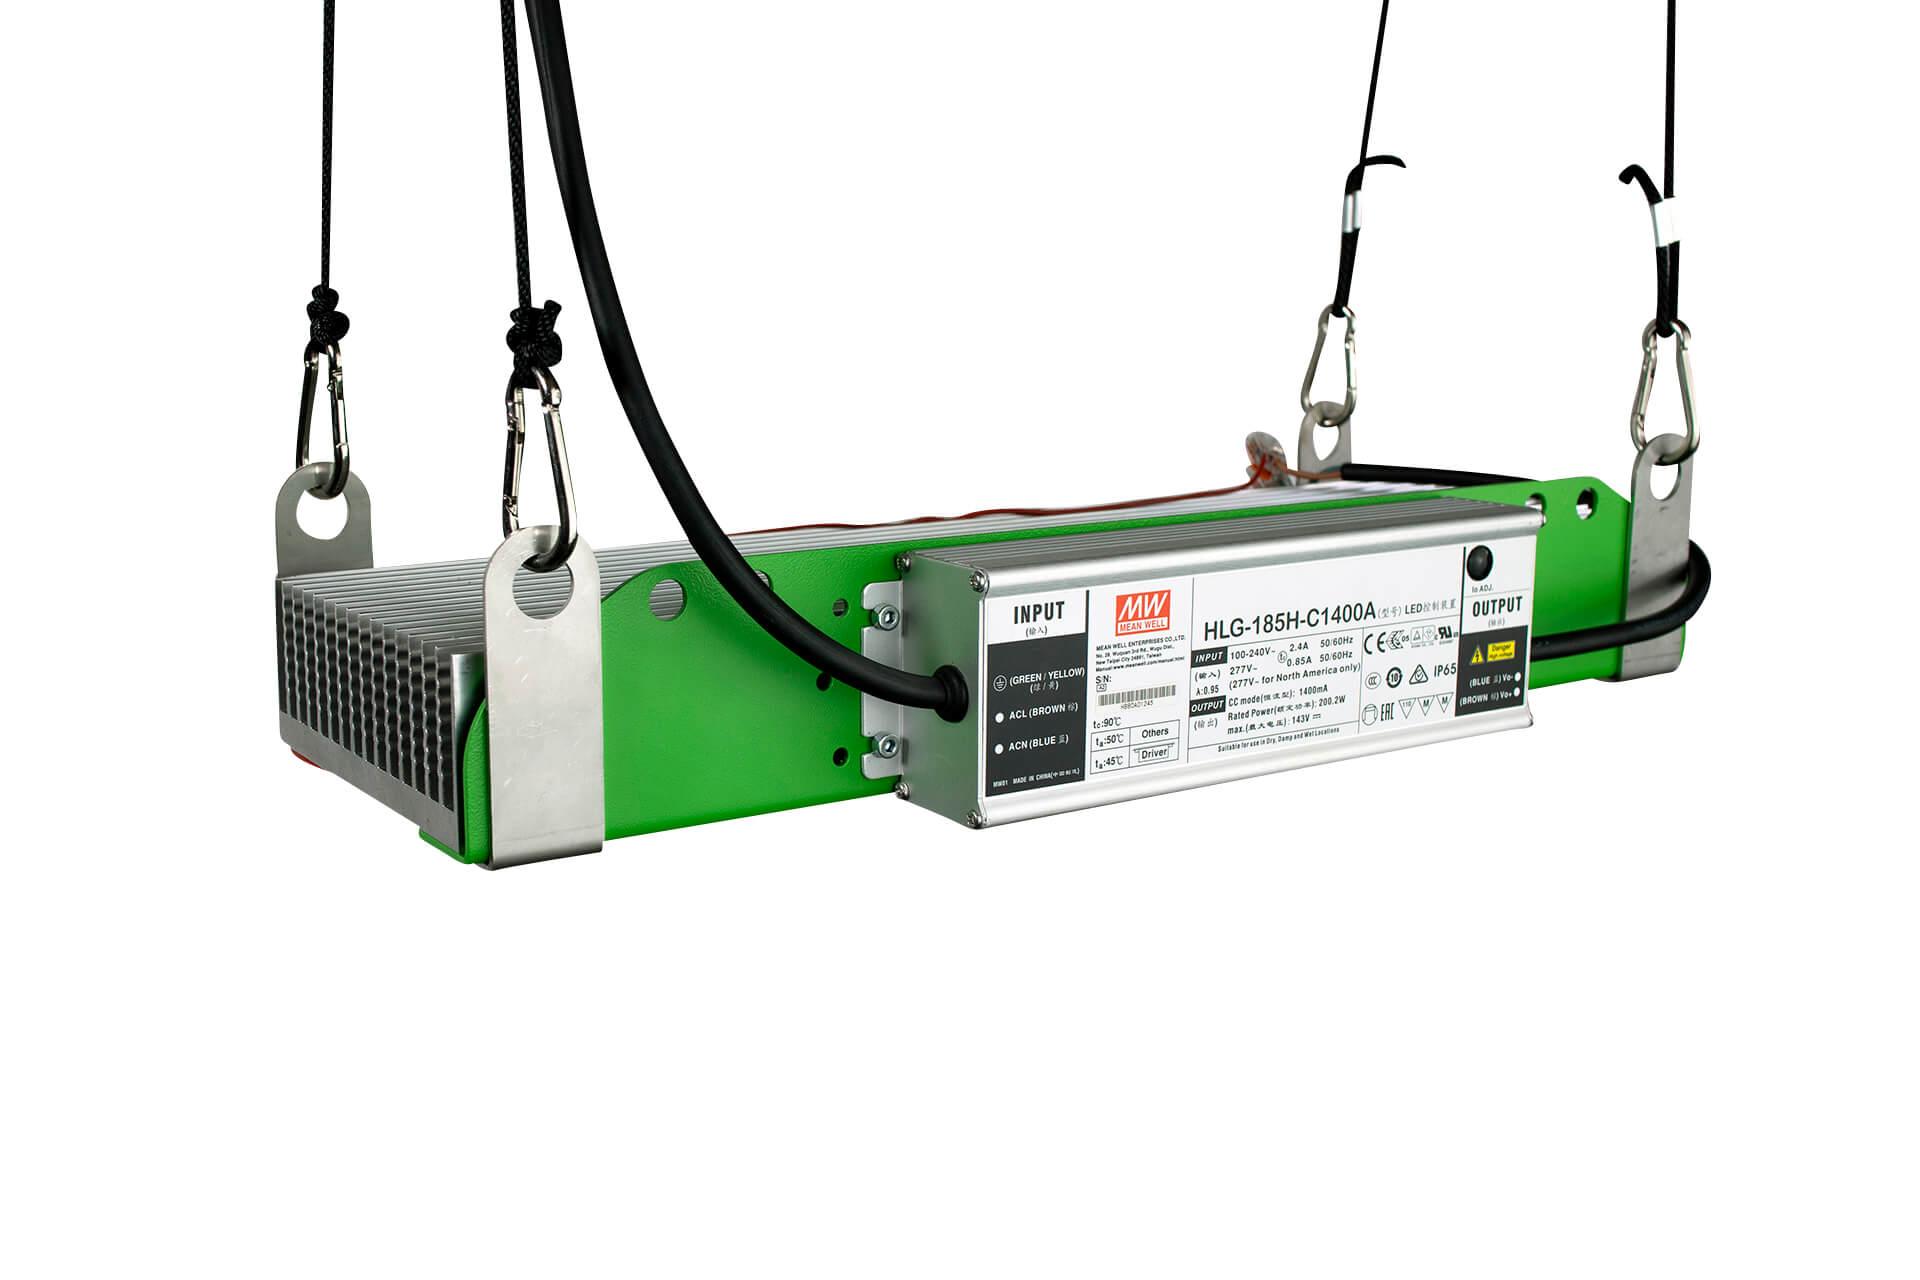 DIY-M-KIT-SMD-100w-birdview-samsung-osram-led-pro-emit